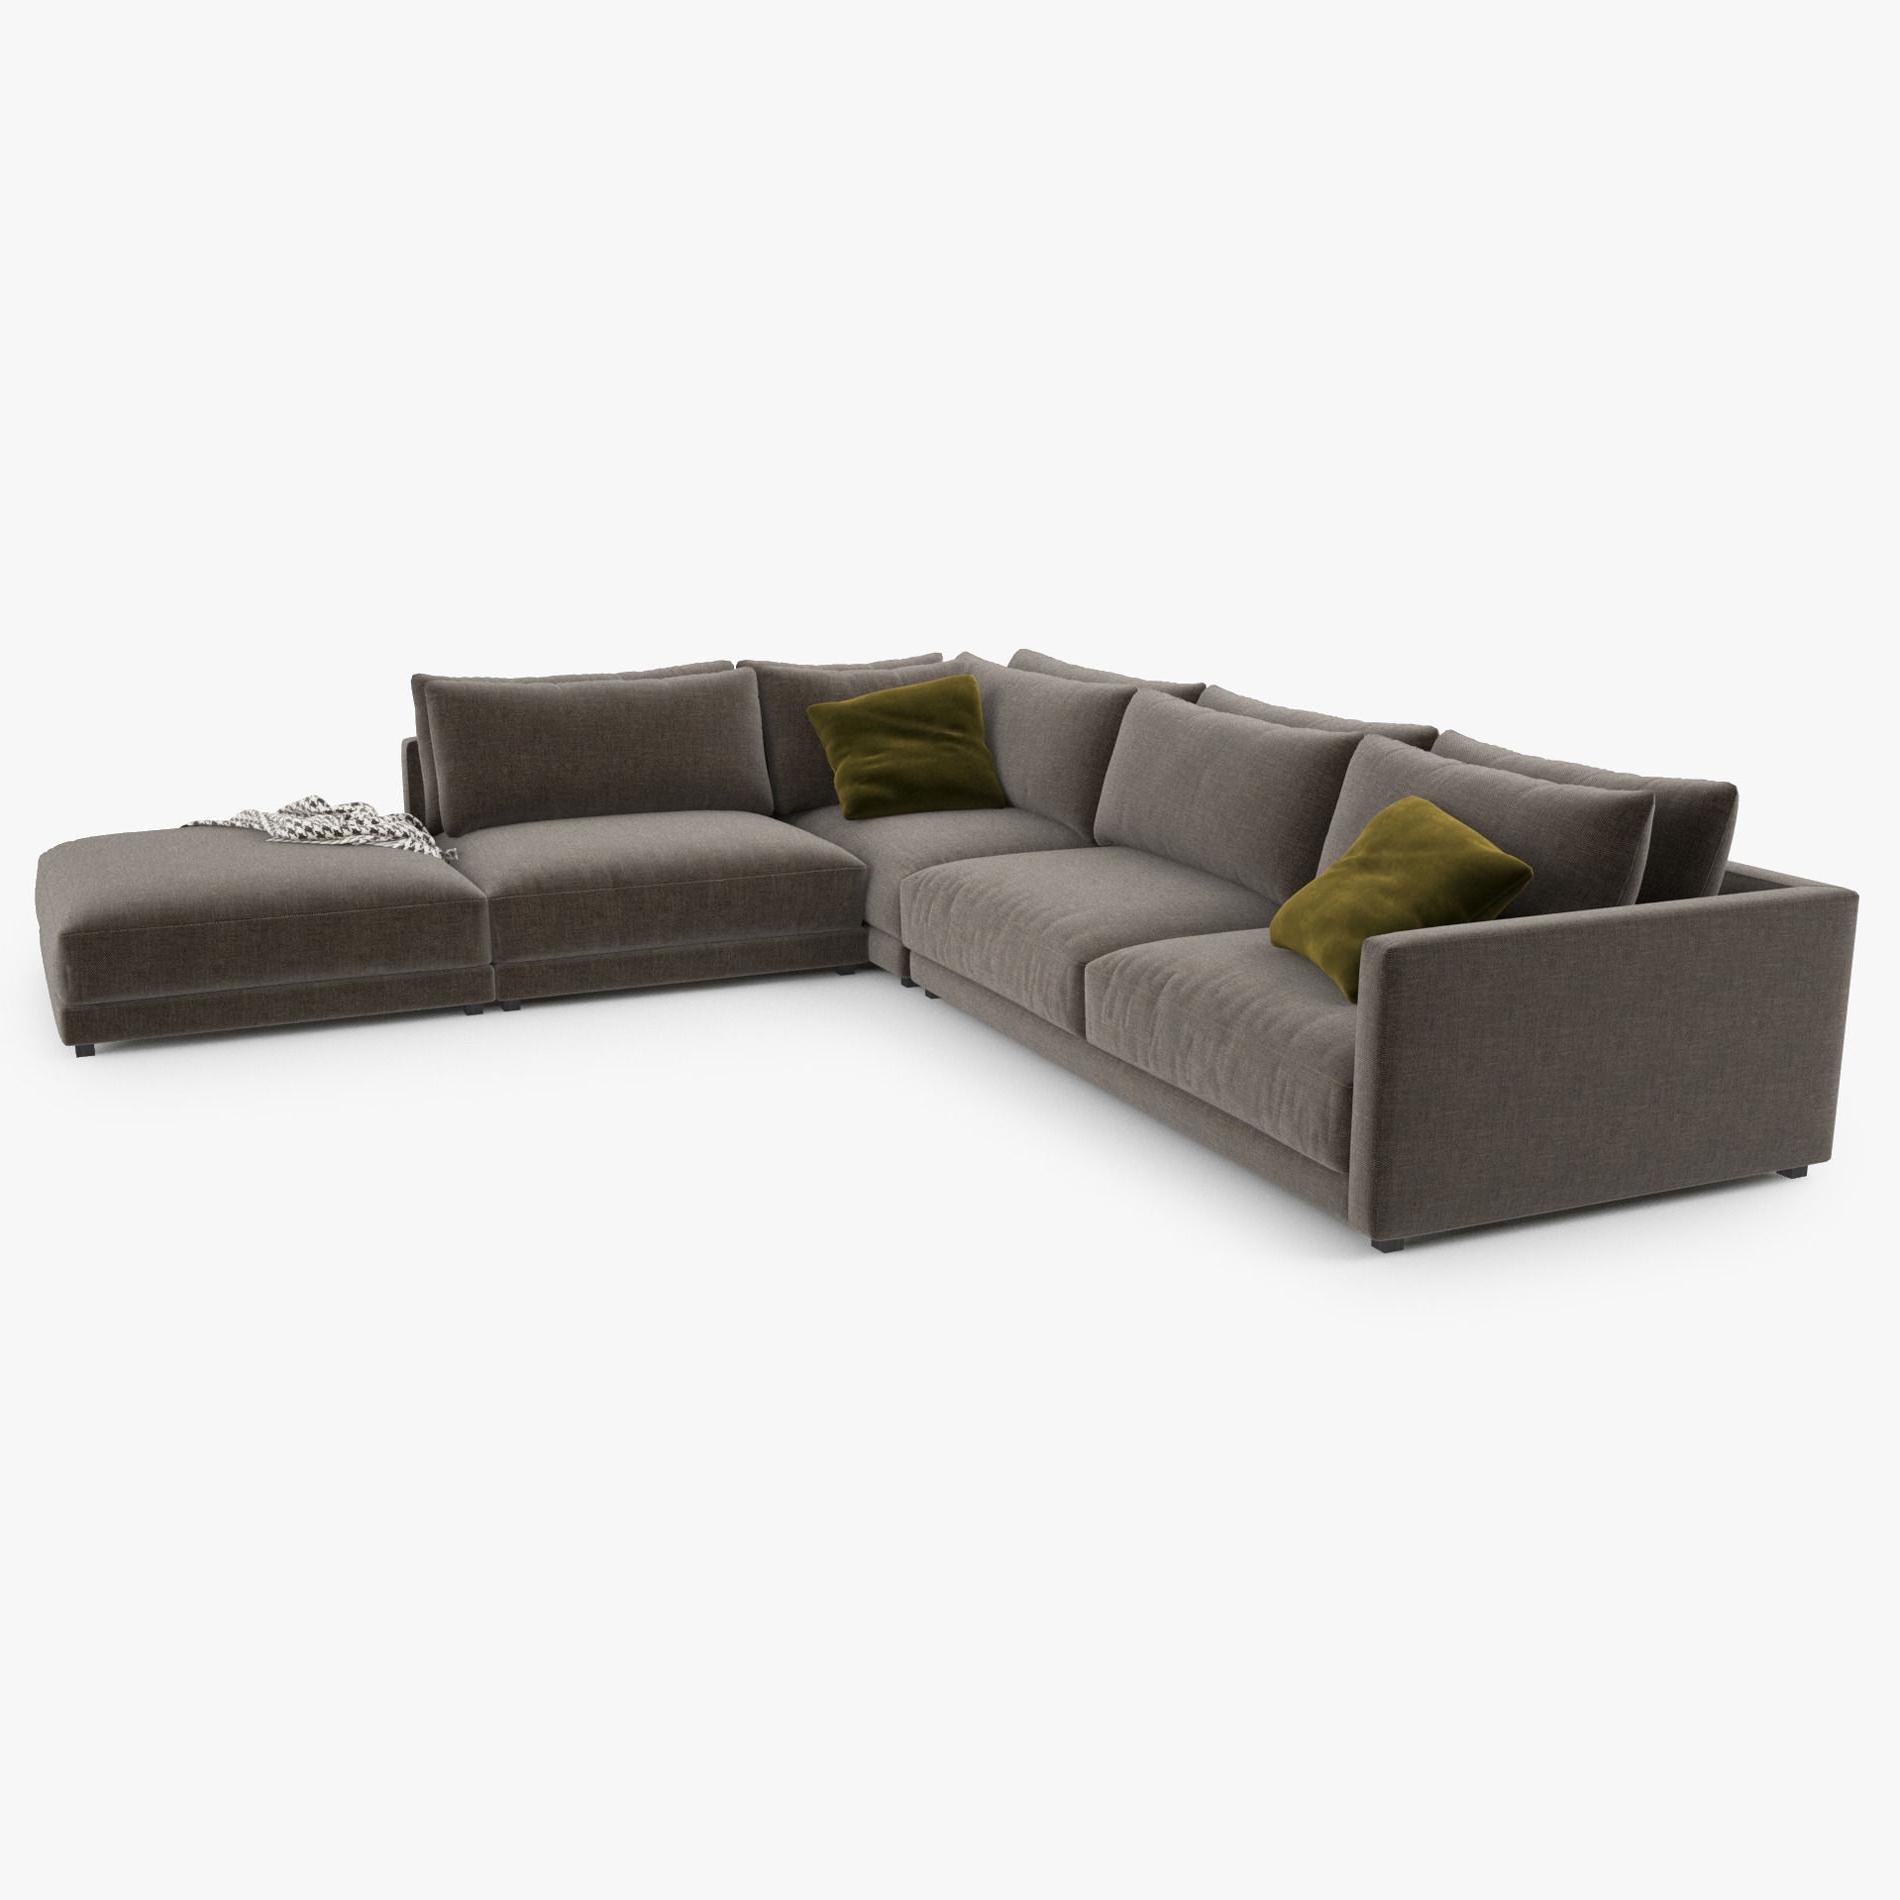 Newest Cheap Sofas Bristol – Fjellkjeden In Bristol Sofas (View 13 of 20)